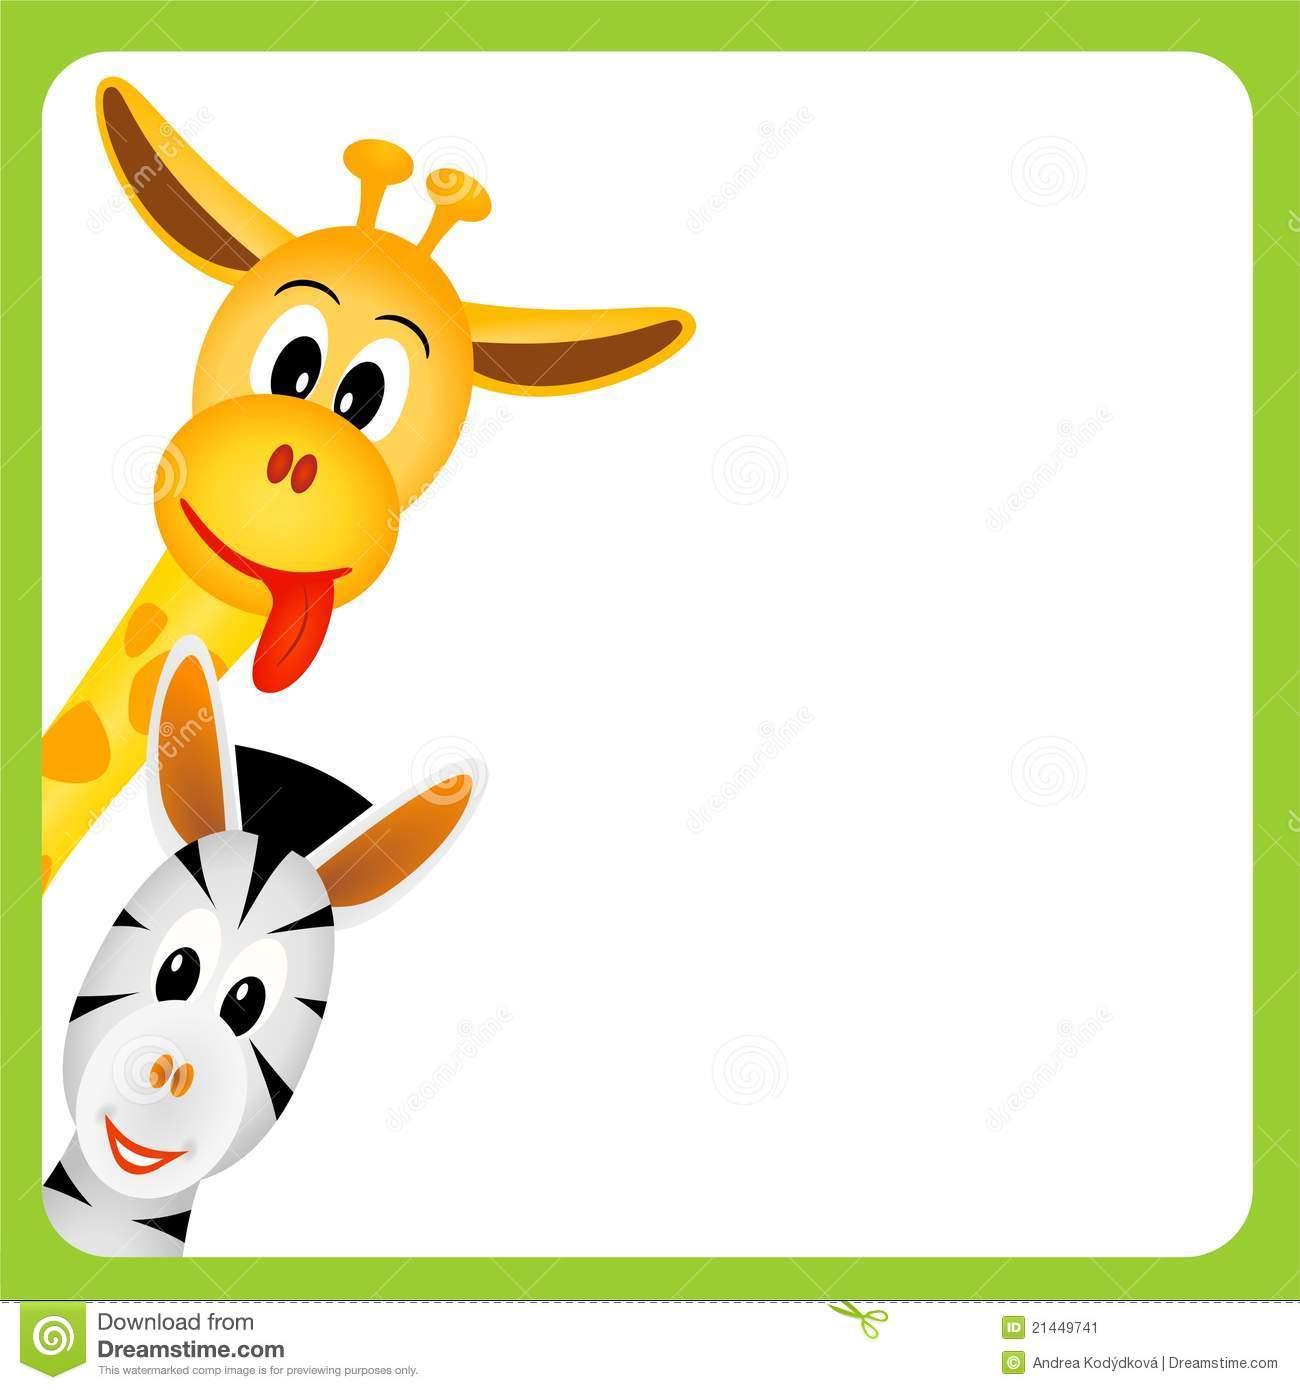 Cute Little Giraffe And Zebra On White Background Stock Image.